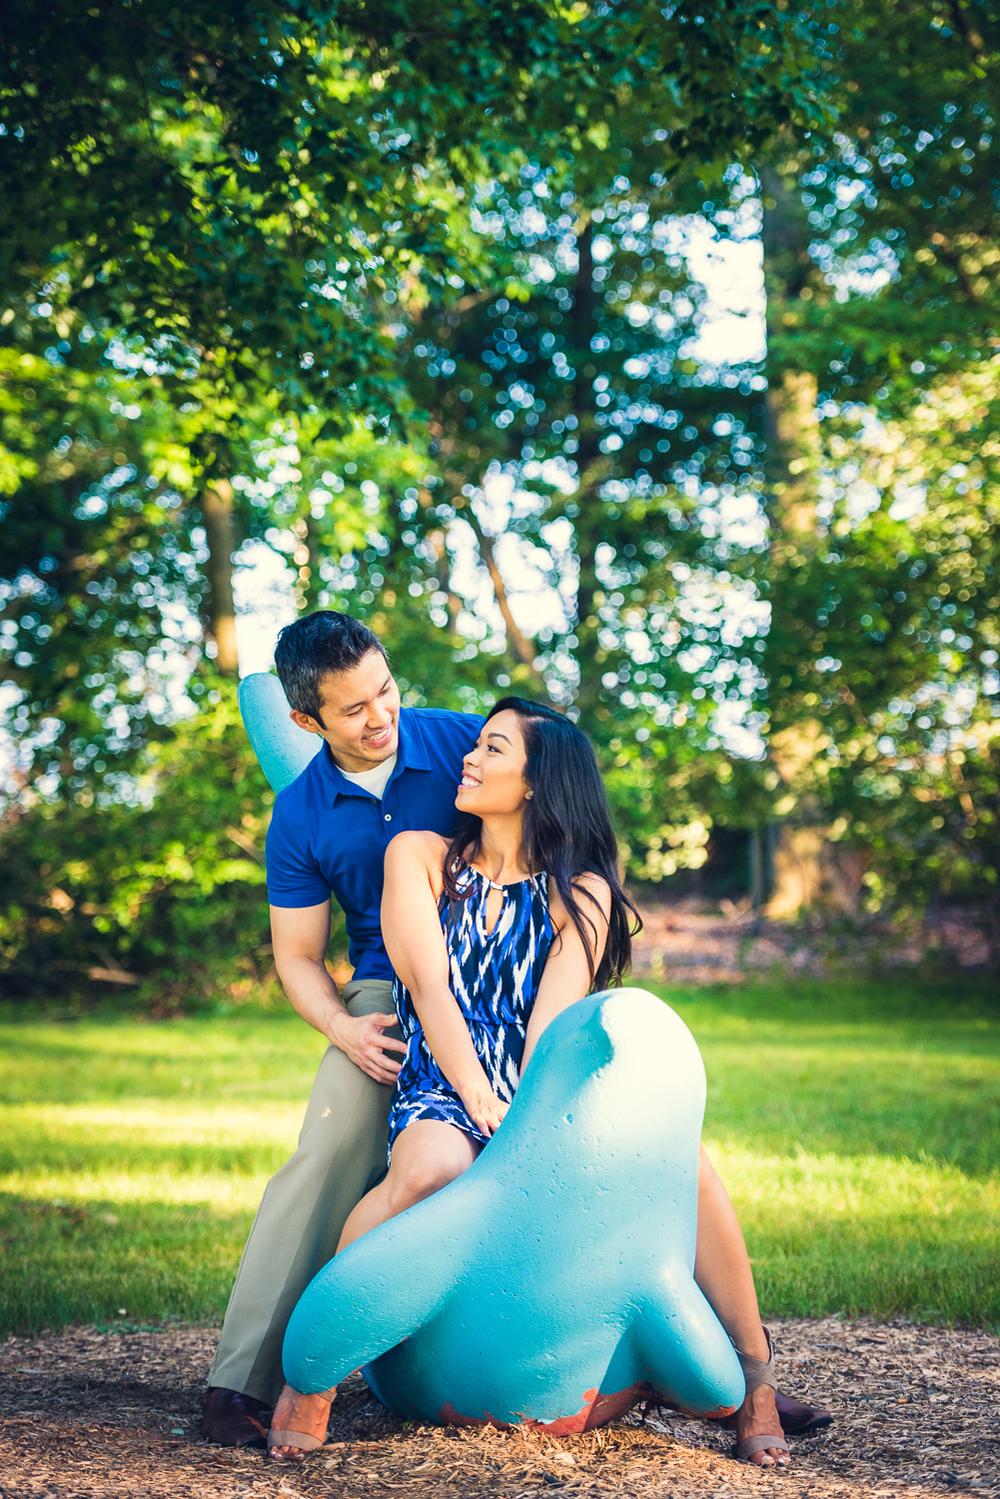 20160705 - Justine Wu Engagement Pix LR-18.jpg